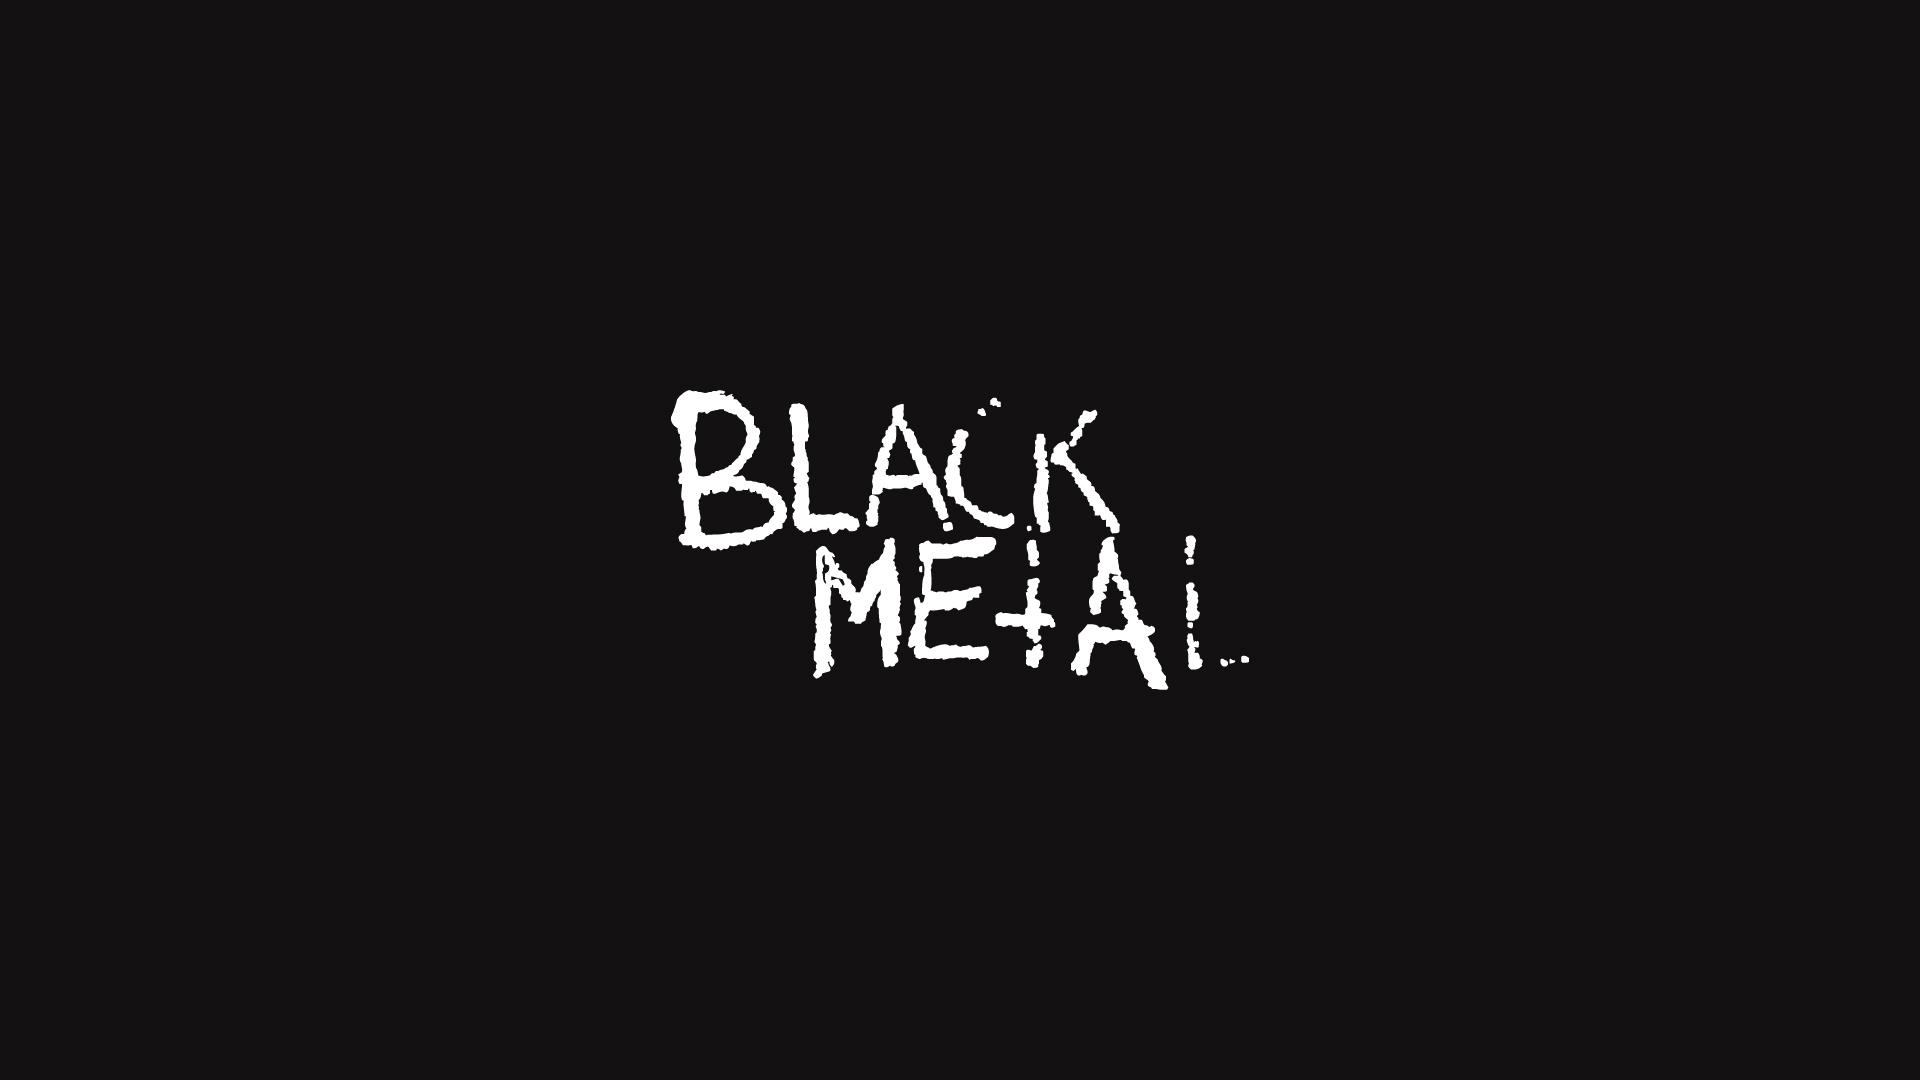 Black metal hd music 4k wallpapers images backgrounds - Black metal wallpaper ...